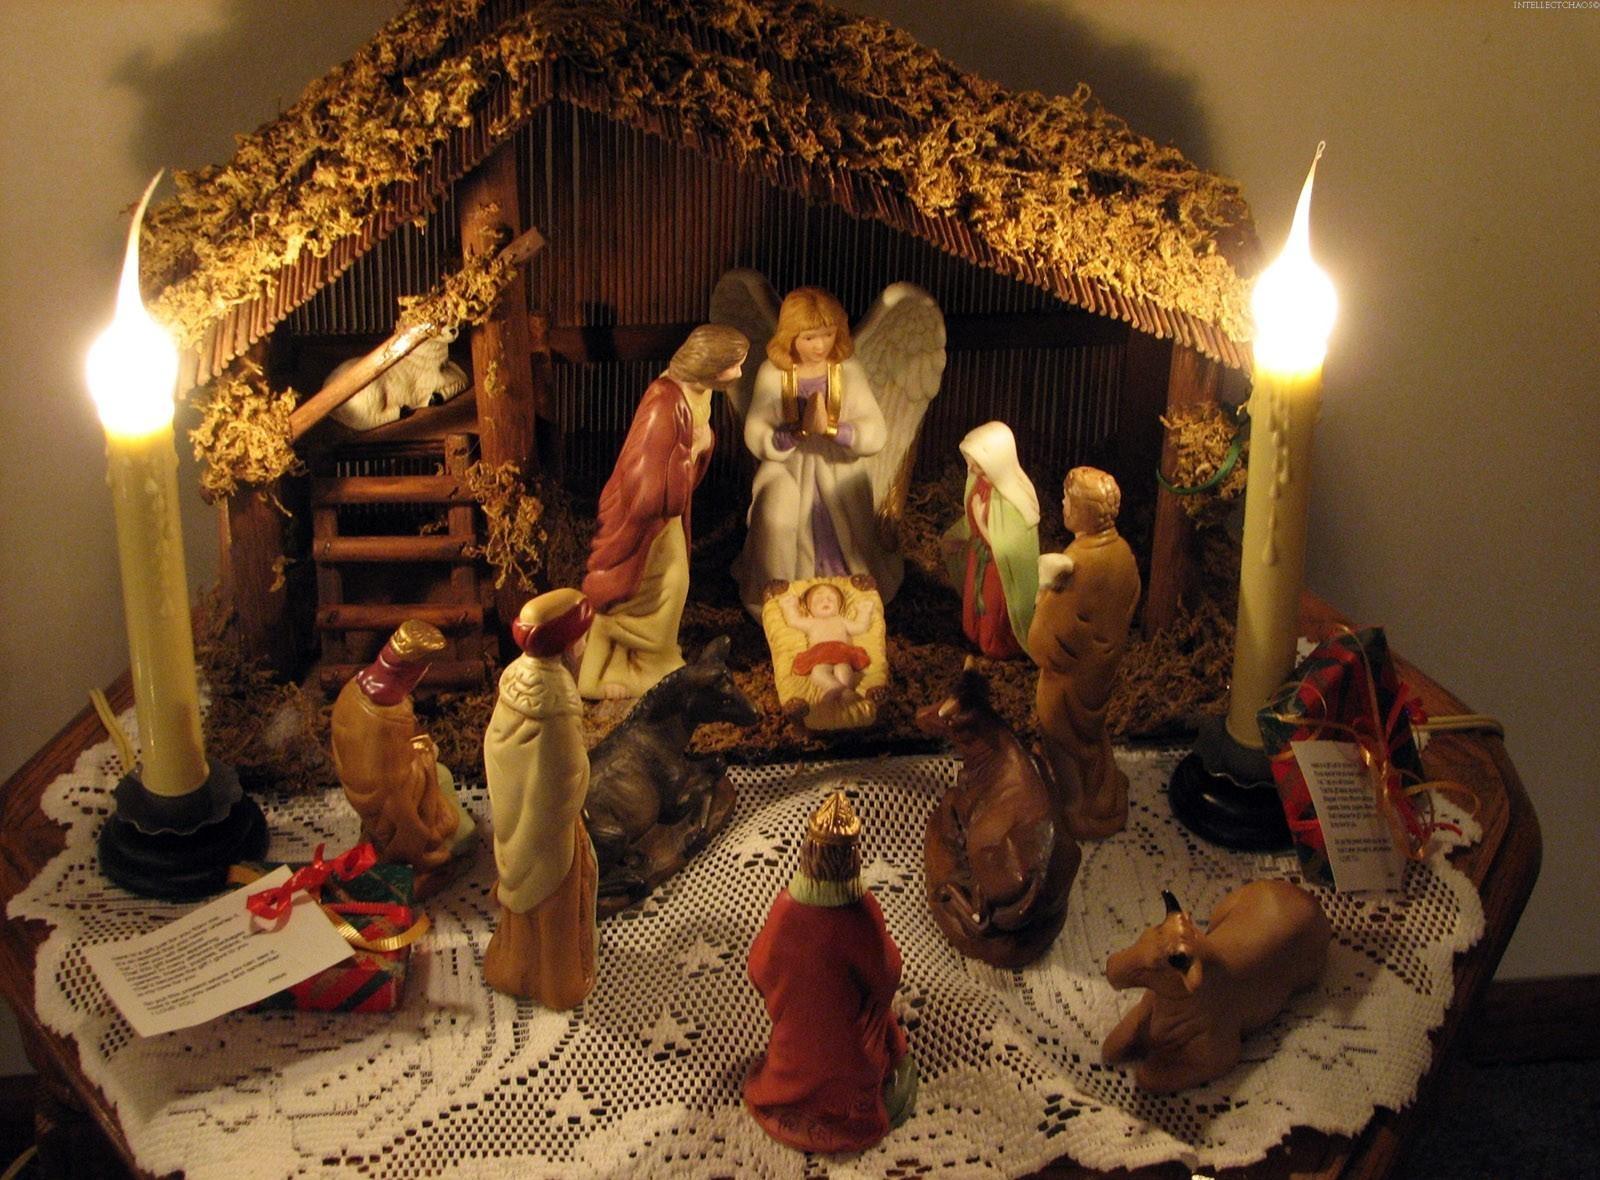 Christmas Jesus Wallpaper.Wallpaper Christmas Holiday Candles Jesus Angel